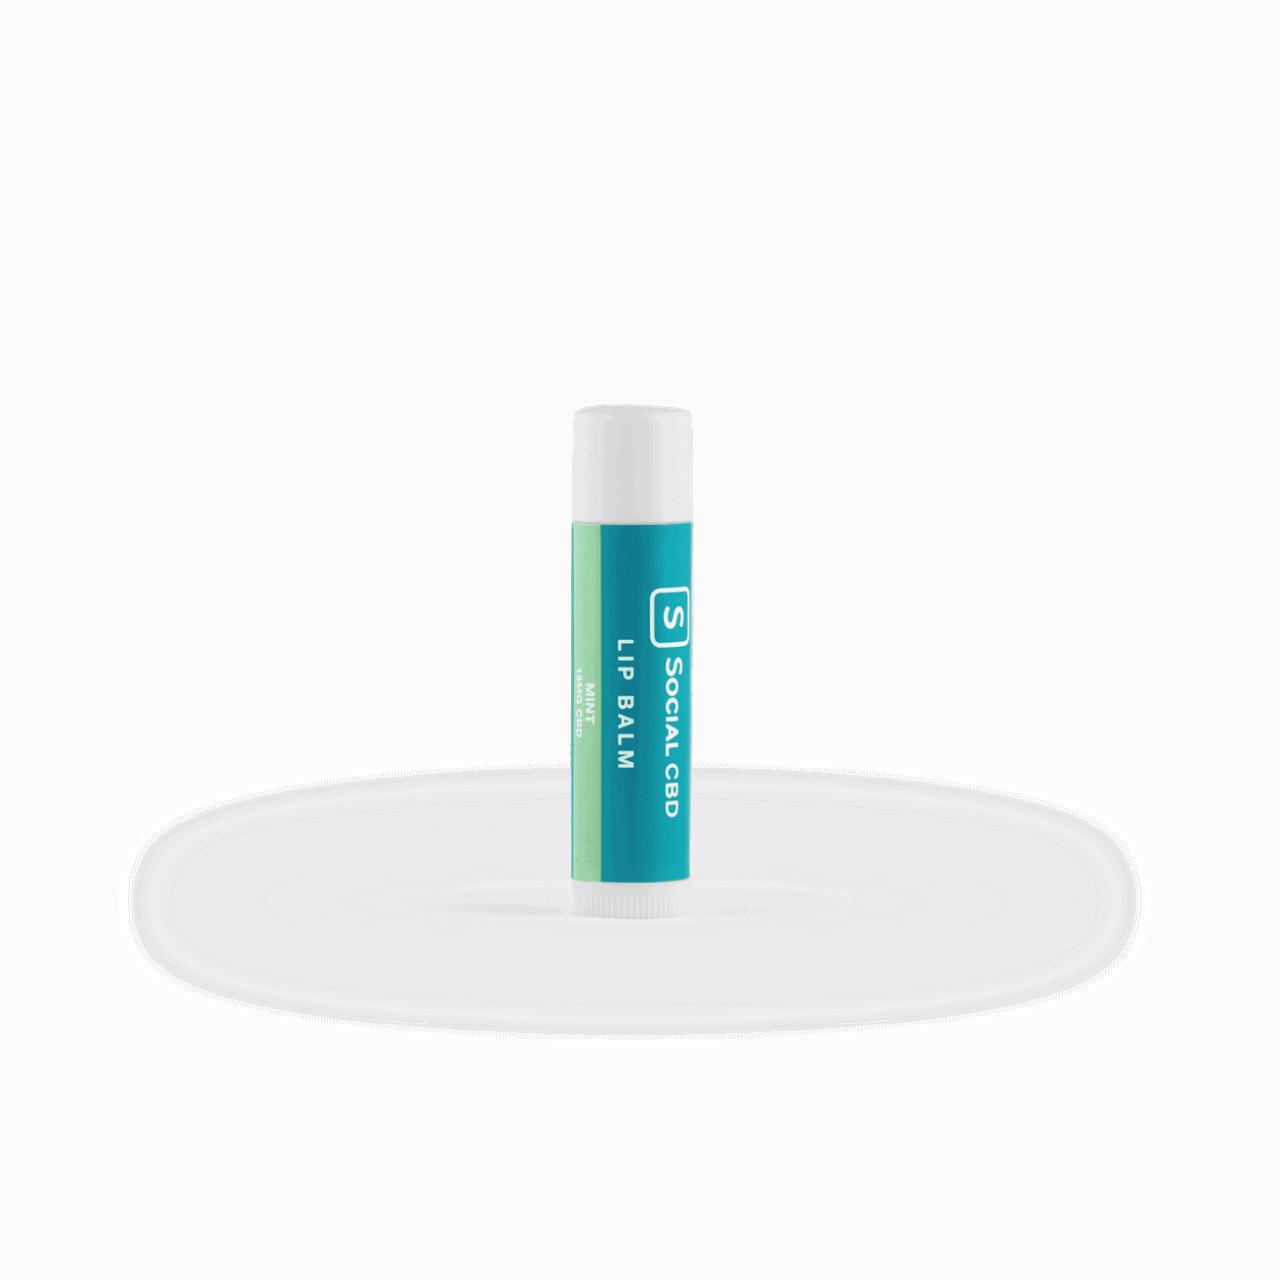 Social CBD, Lip Balm, Isolate THC-Free, Mint, 0.15oz, 15mg CBD 1